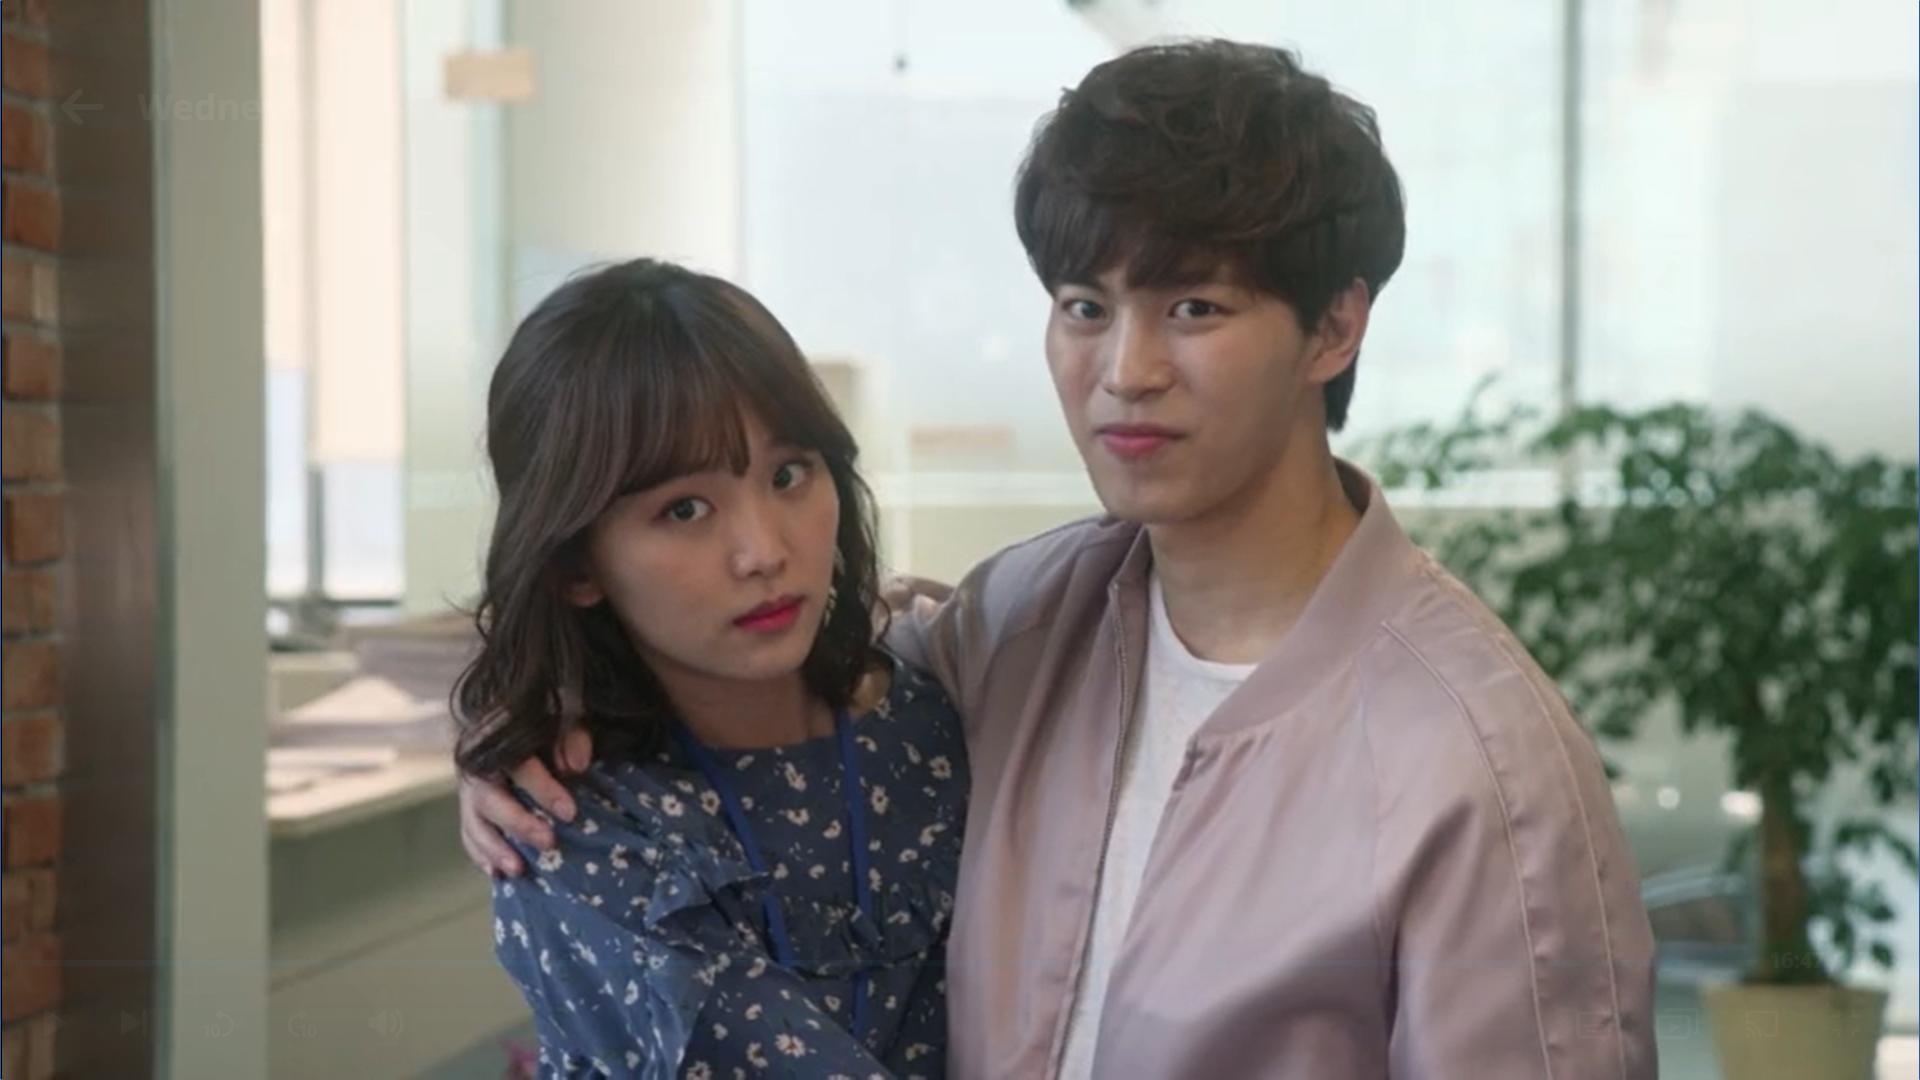 Wednesday 3:30 PM Seon Eun-woo and Yoon Jae-won staring at Baek Seung-gyu